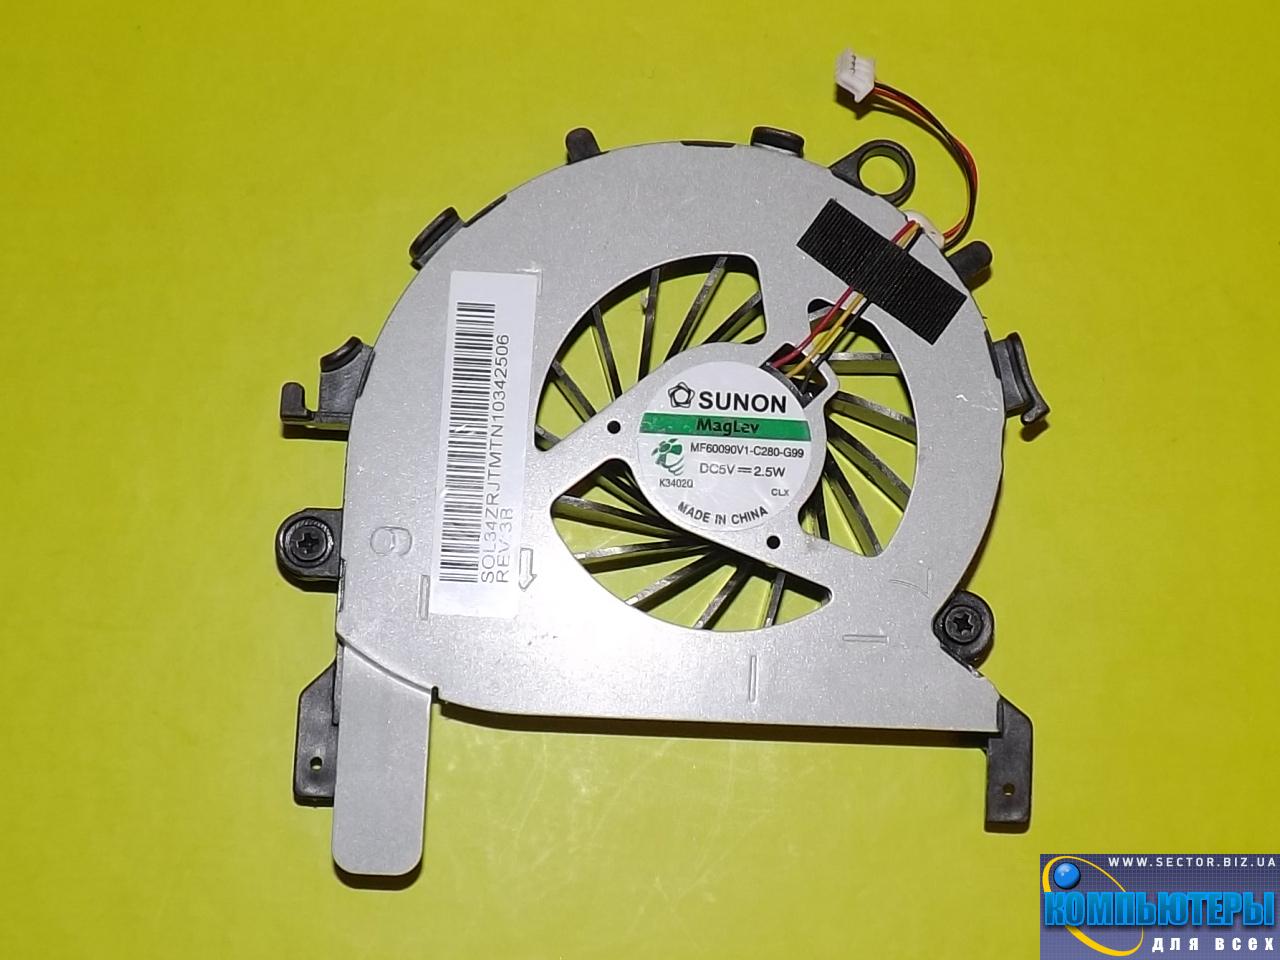 Кулер к ноутбуку Acer TravelMate 5360 5760 5760G 5760Z 5760ZG p/n: MF60090V1-C280-G99. Фото № 2.